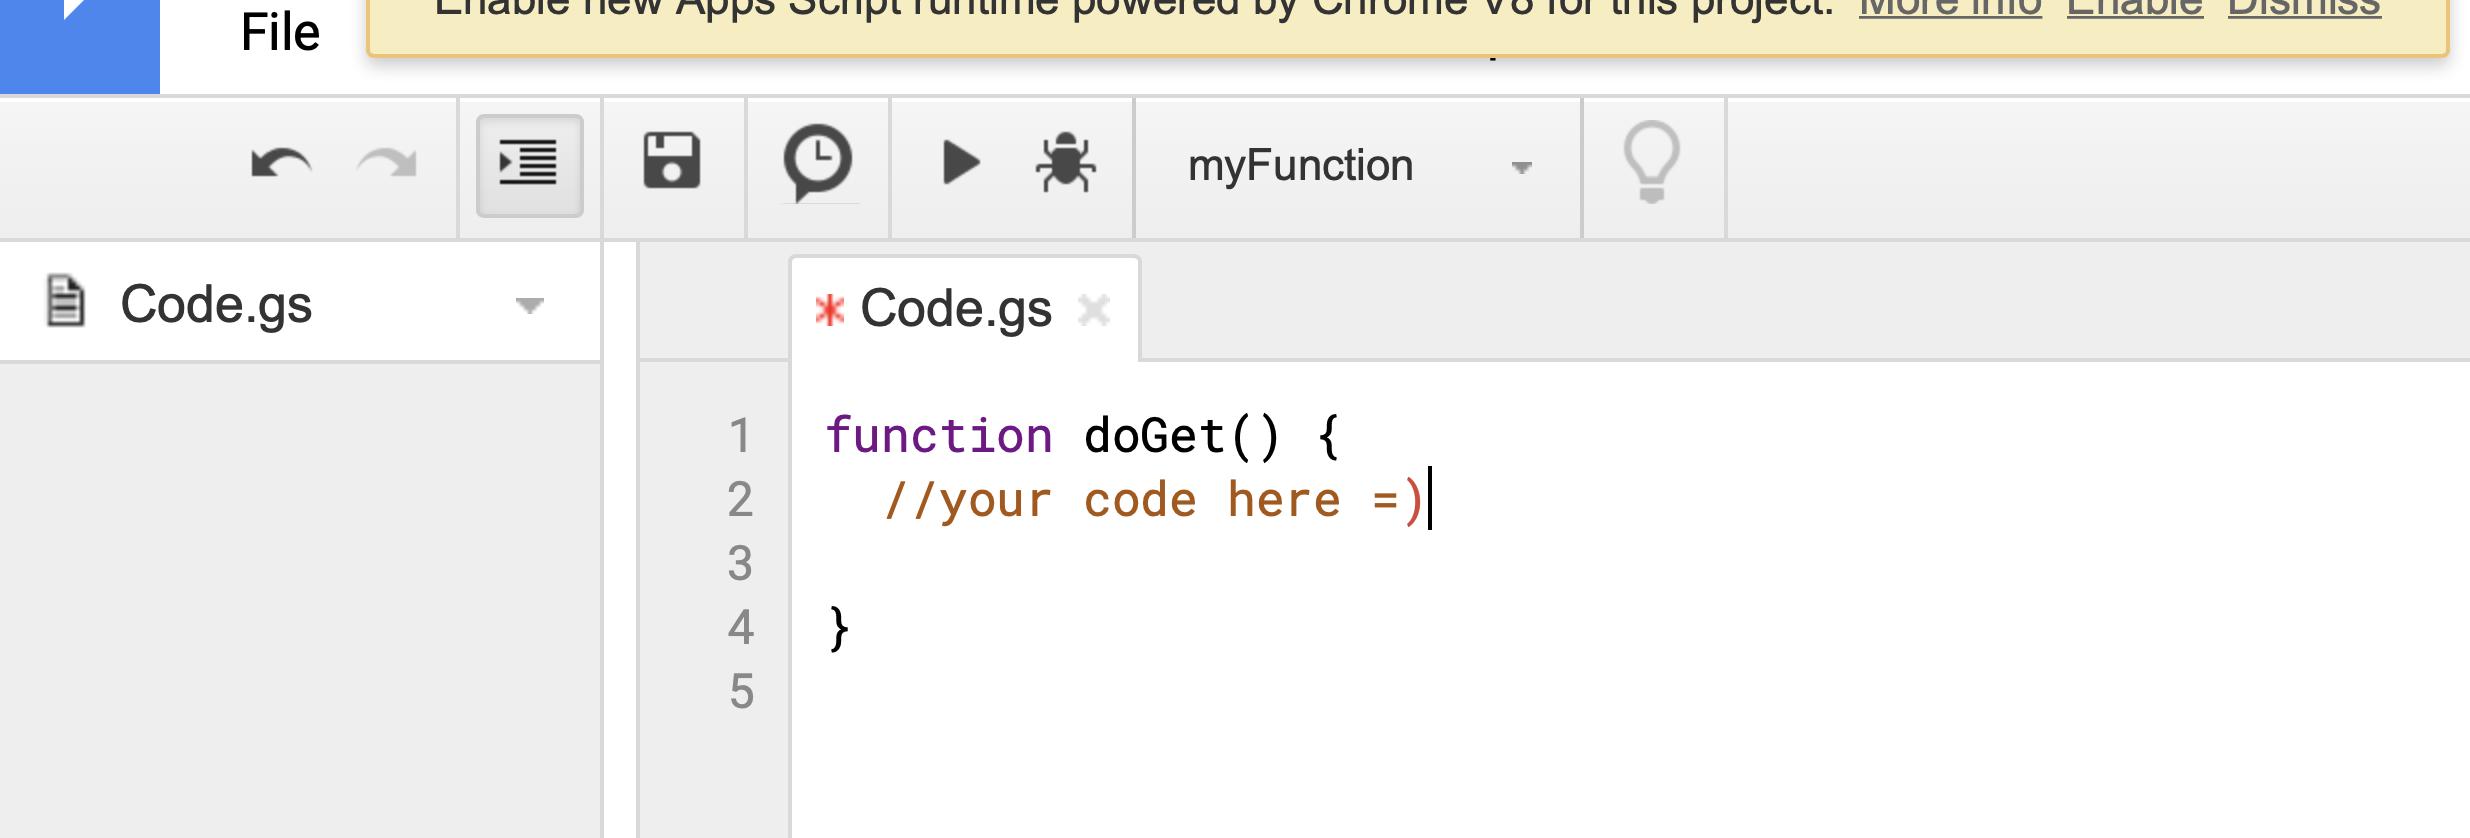 google sheet code editor sample